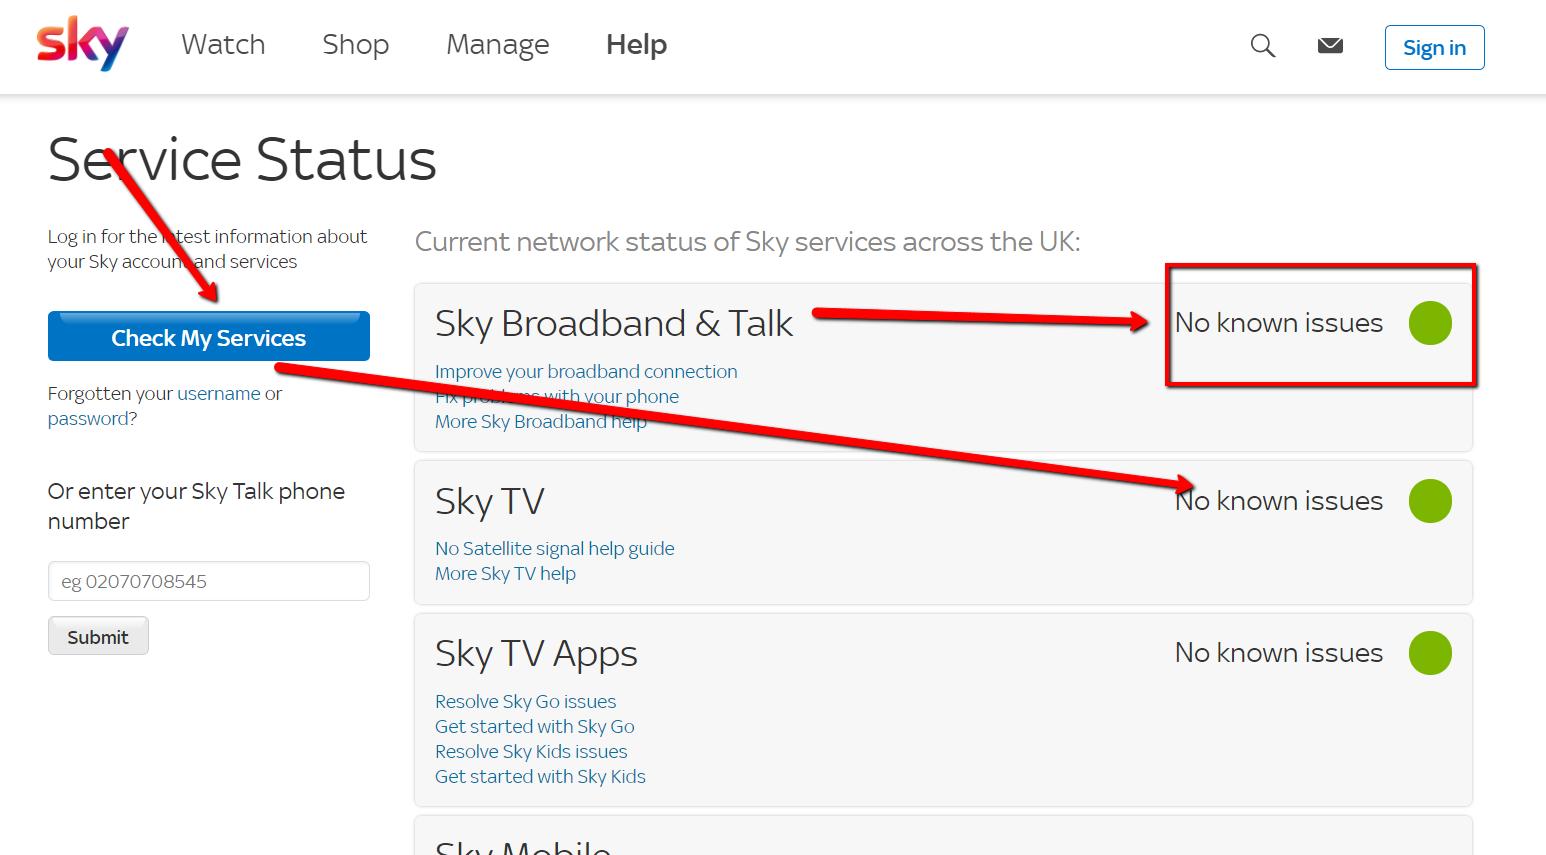 sky service status